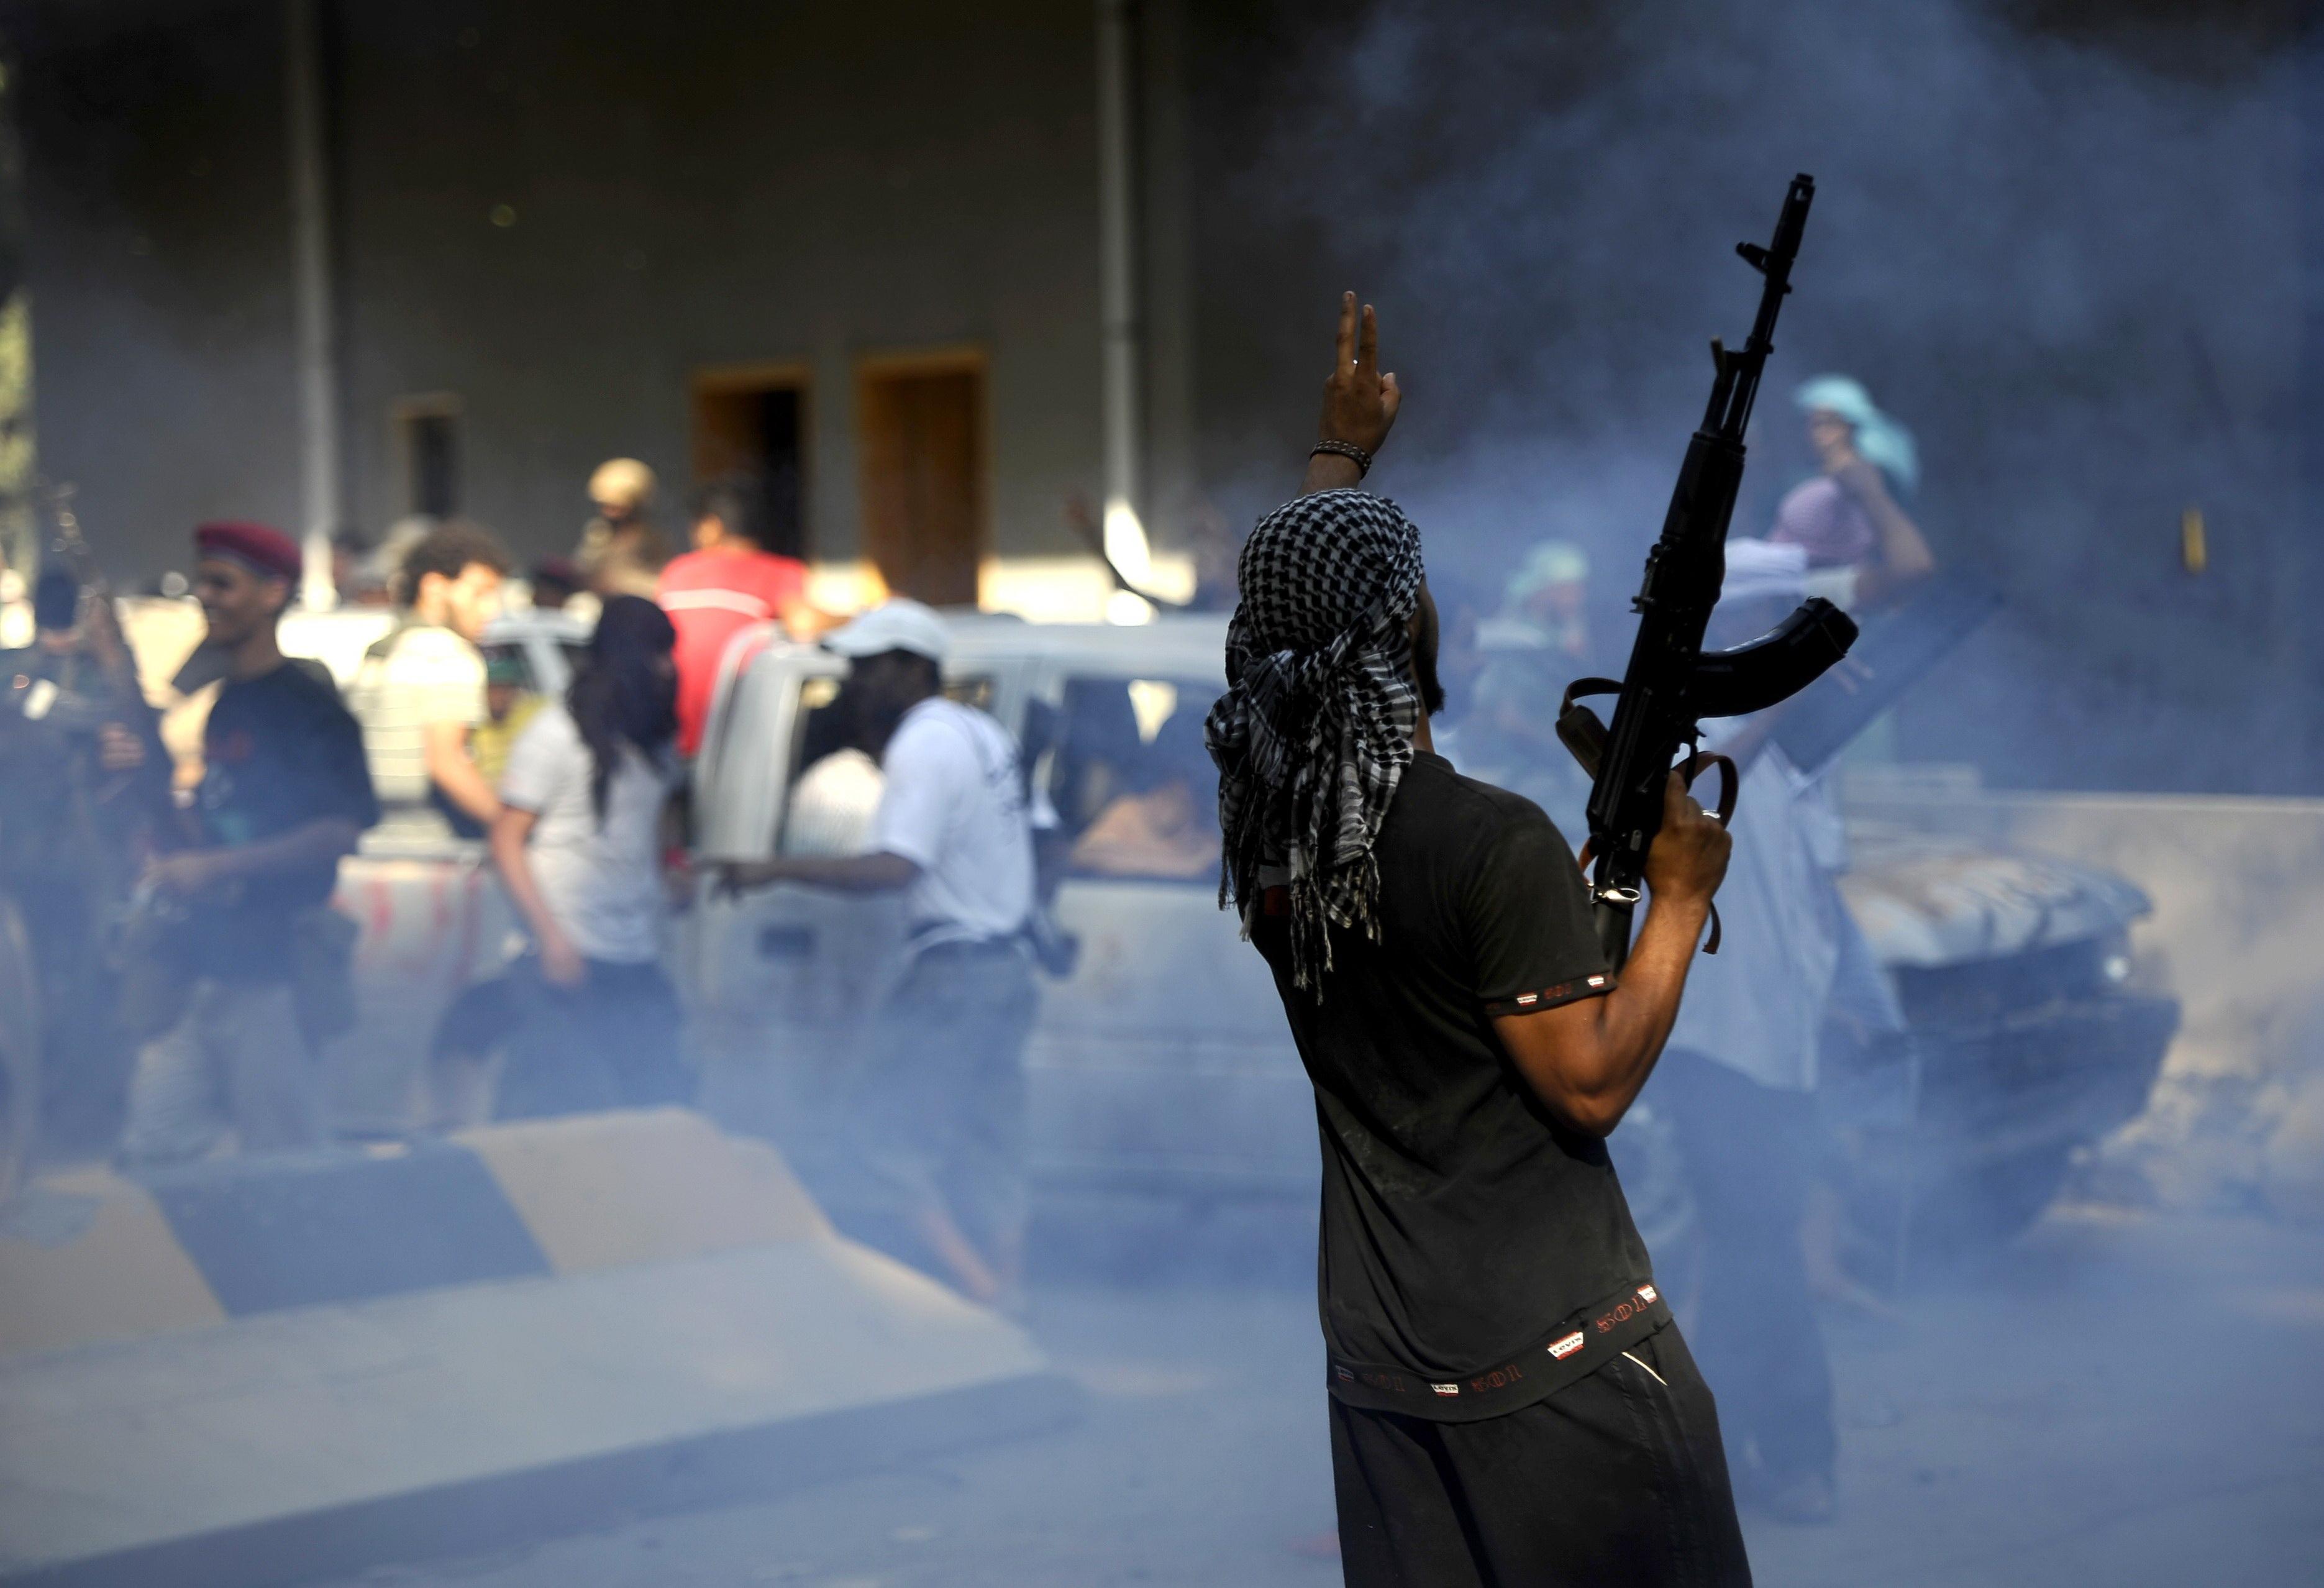 Rebelii dau ultima batalie pentru Tripoli. Obama: